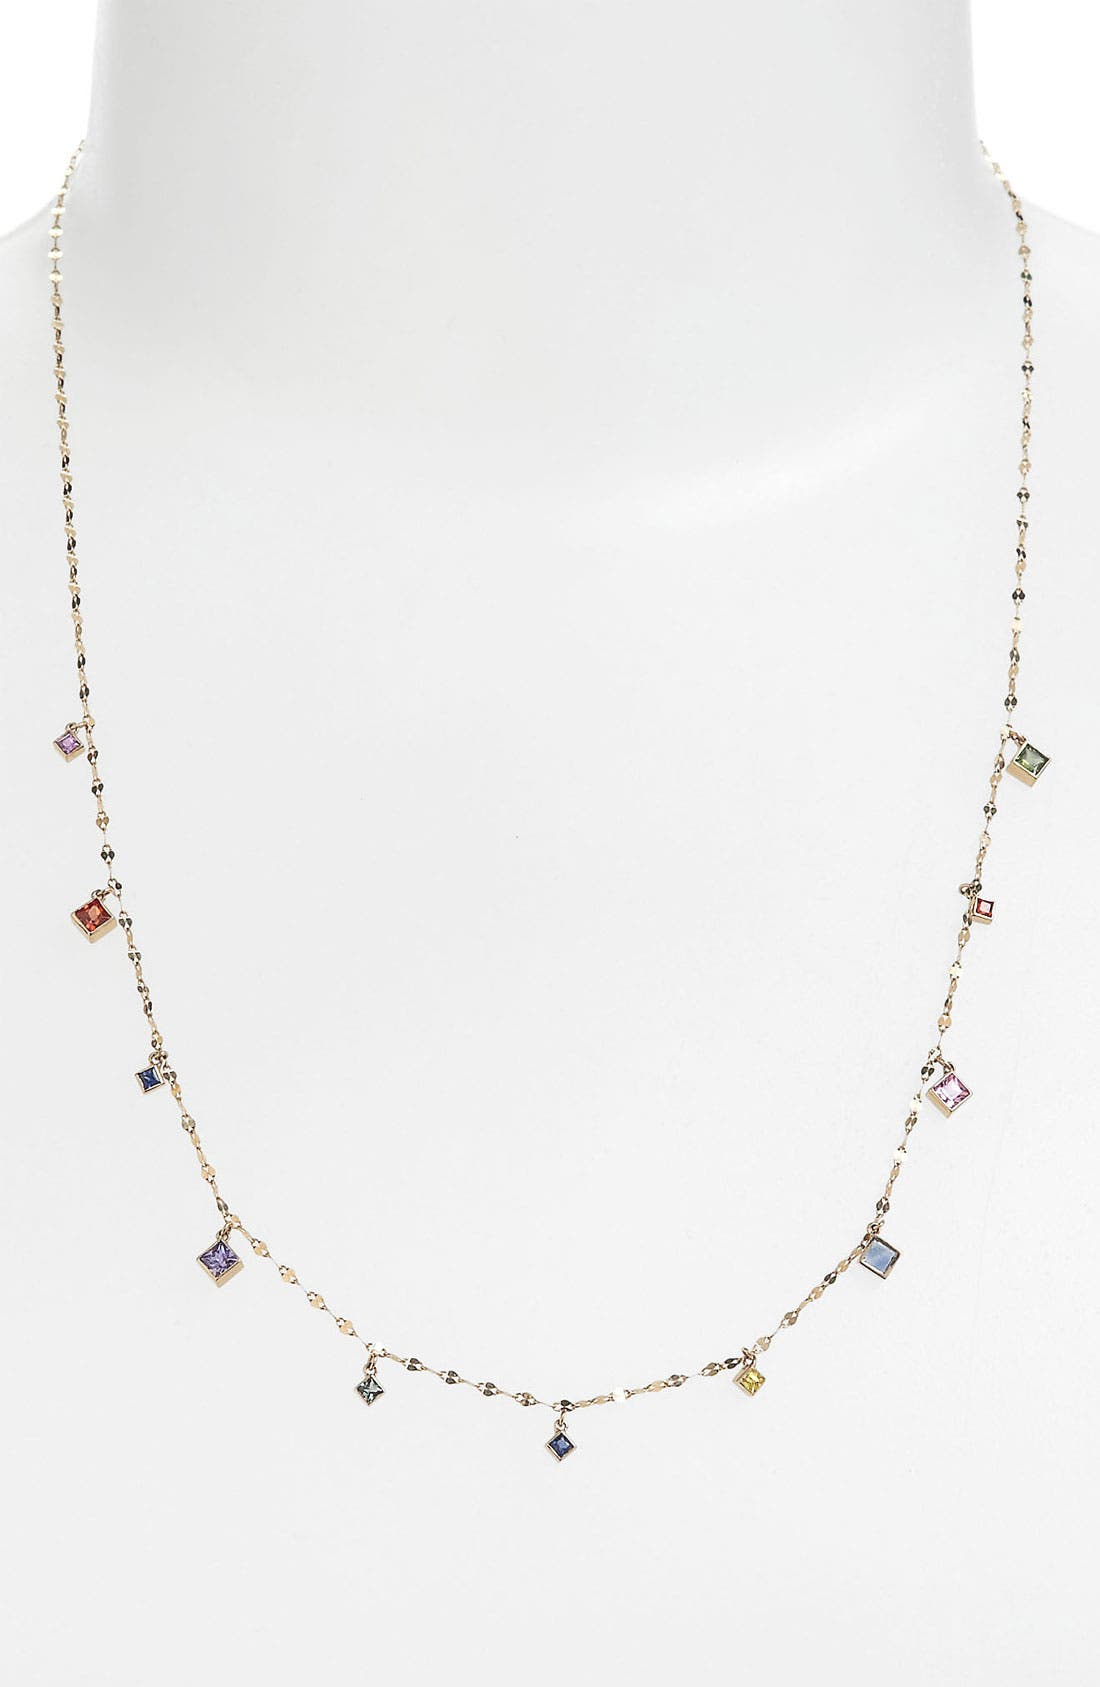 Main Image - Lana Jewelry 'Gypsy' Sapphire Necklace